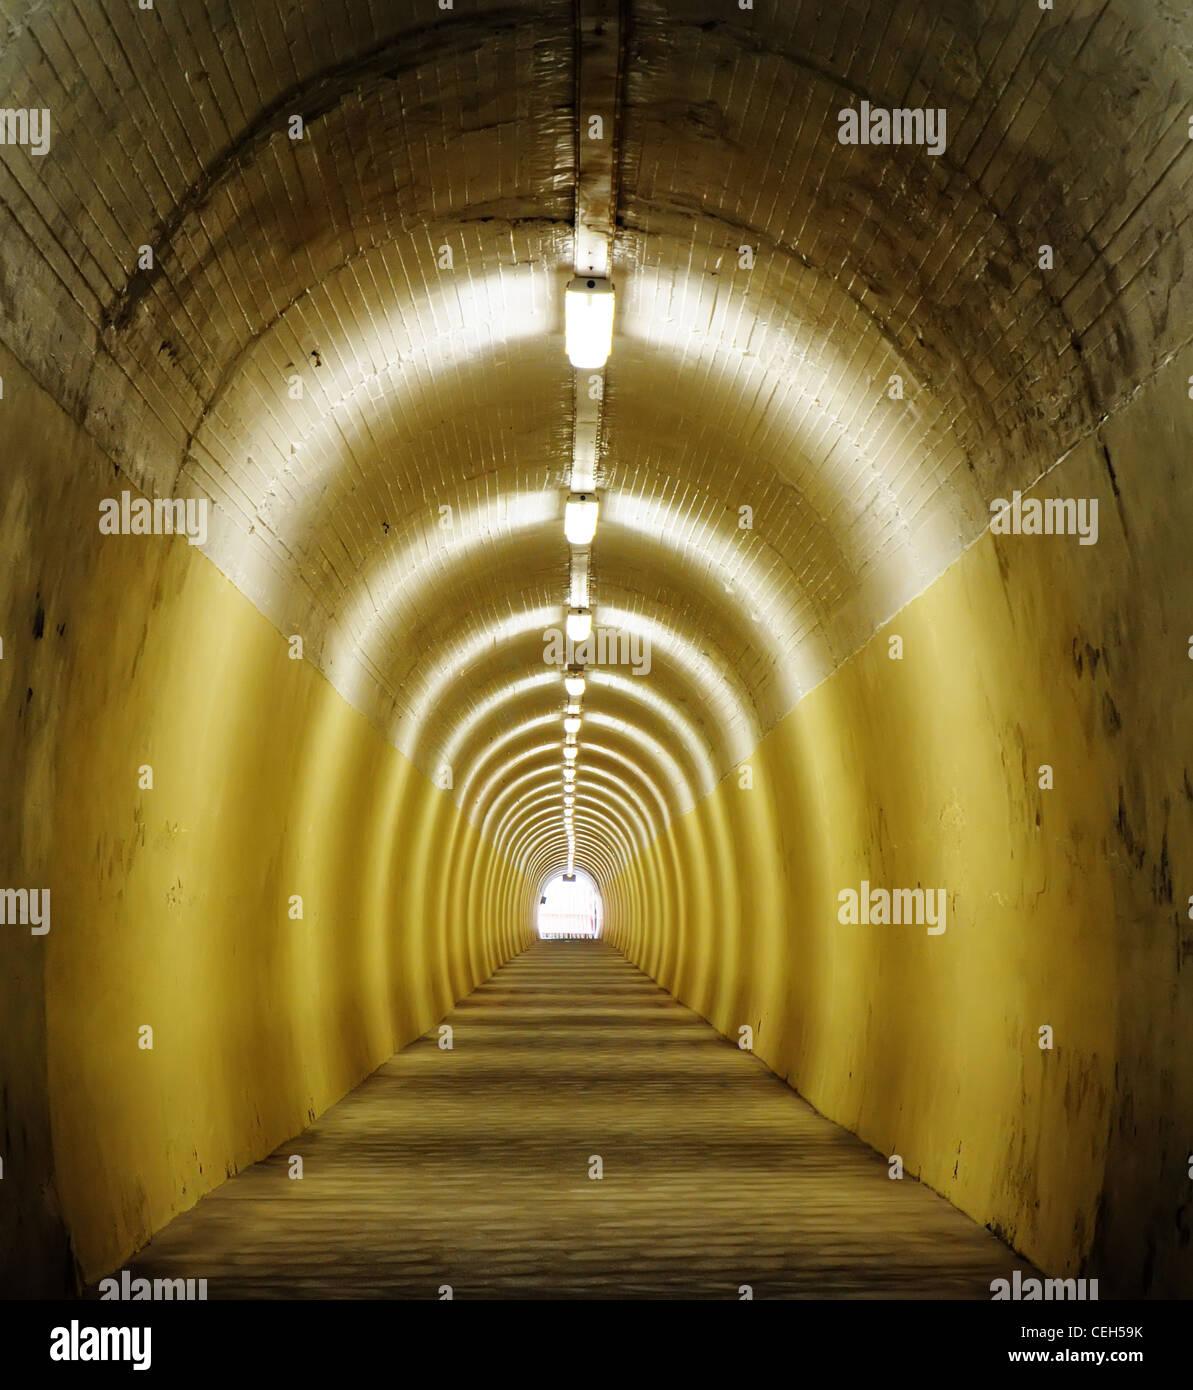 Underground Passage Stock Photos & Underground Passage